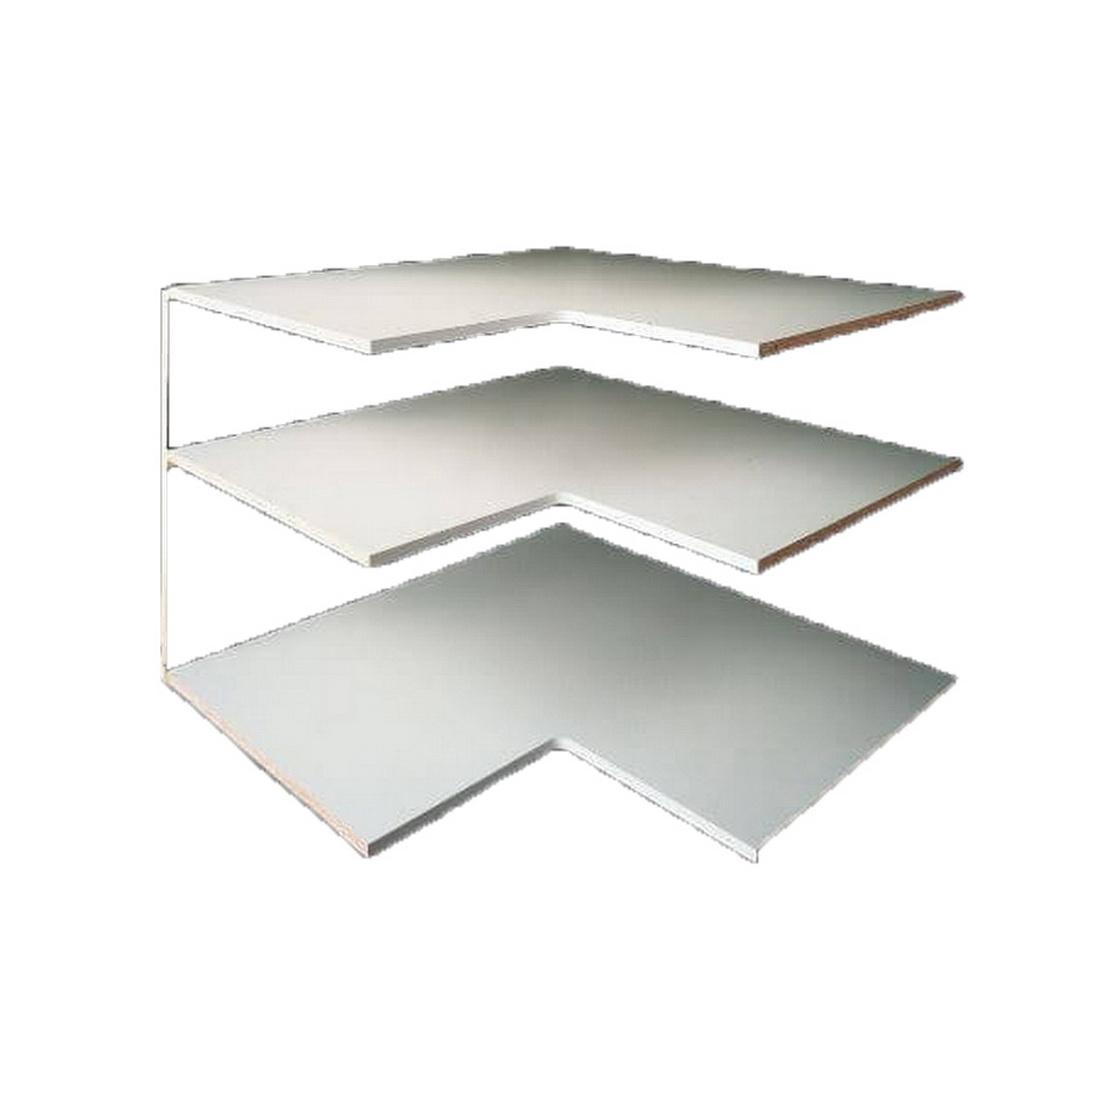 Laminex Whiteboard MDF Panel 2440 x 1220 x 12 mm Gloss 872036